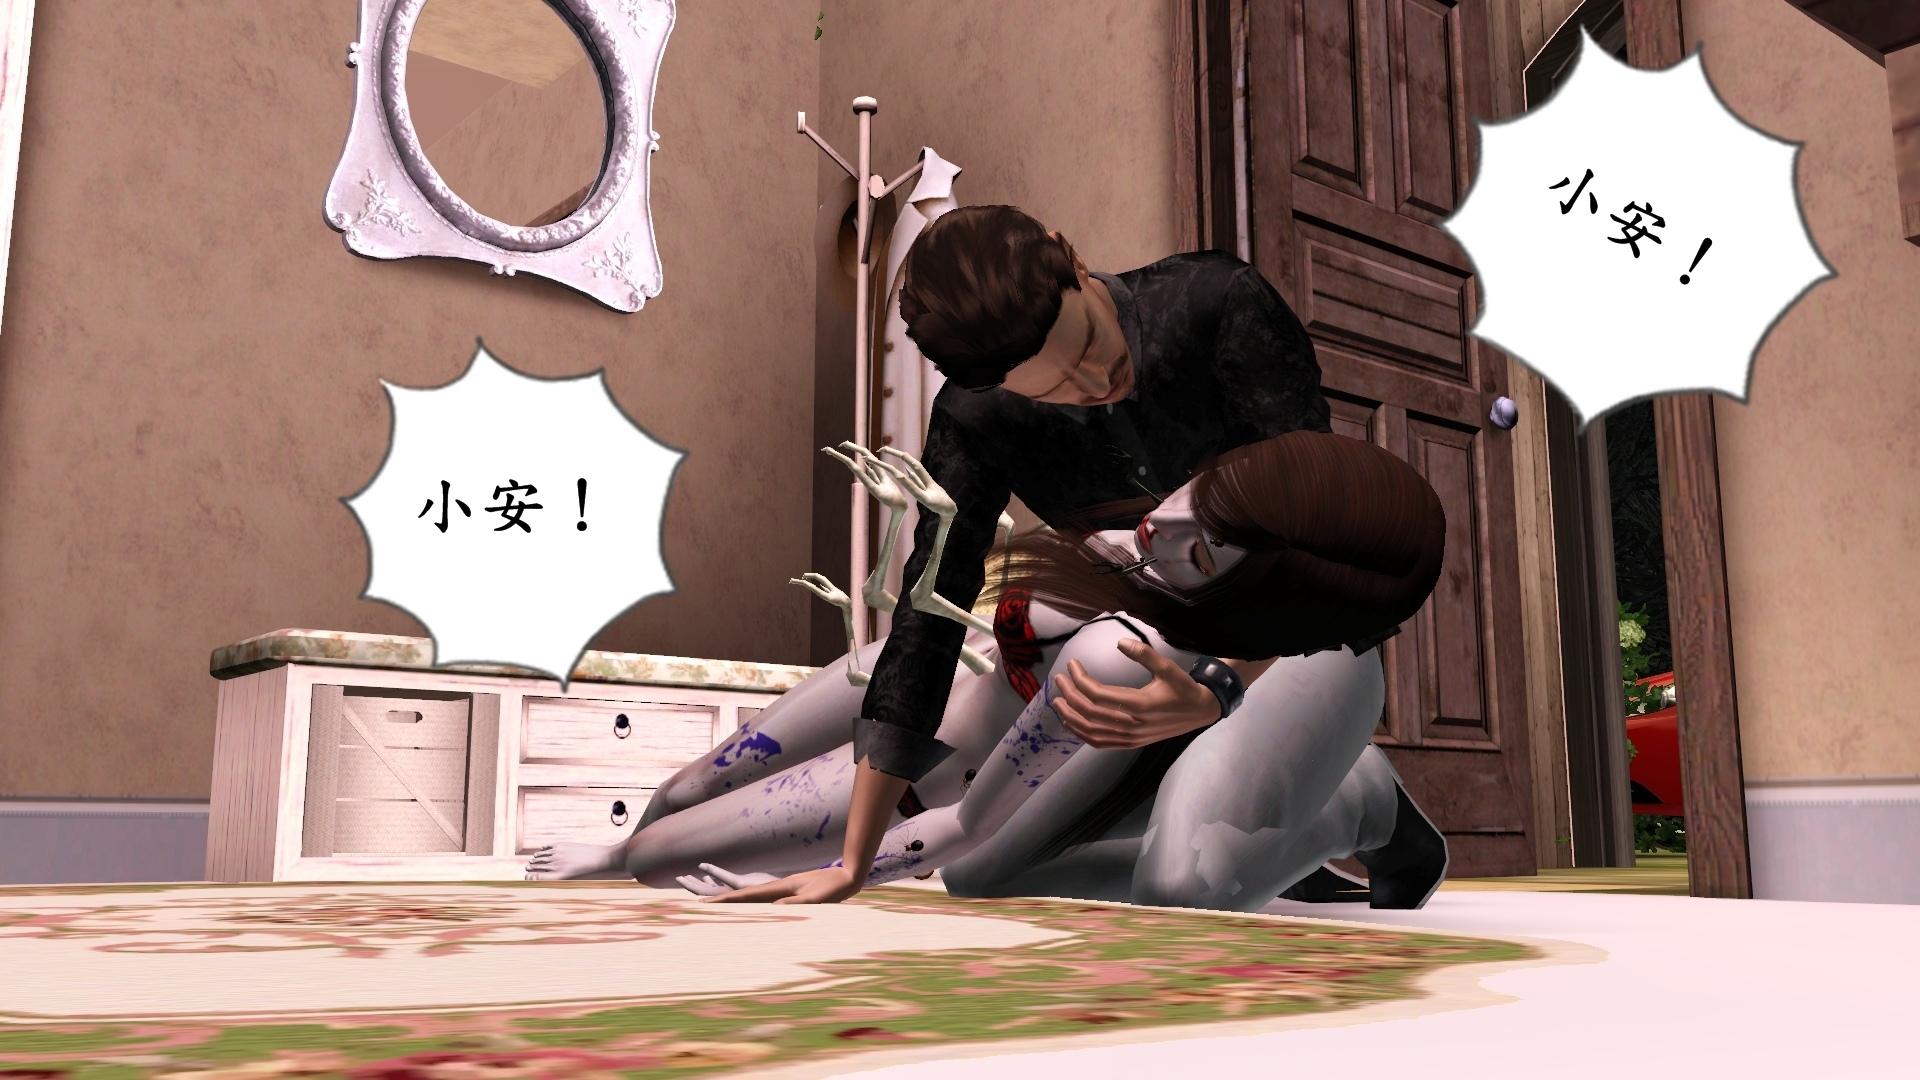 A40小安!小安!.jpg